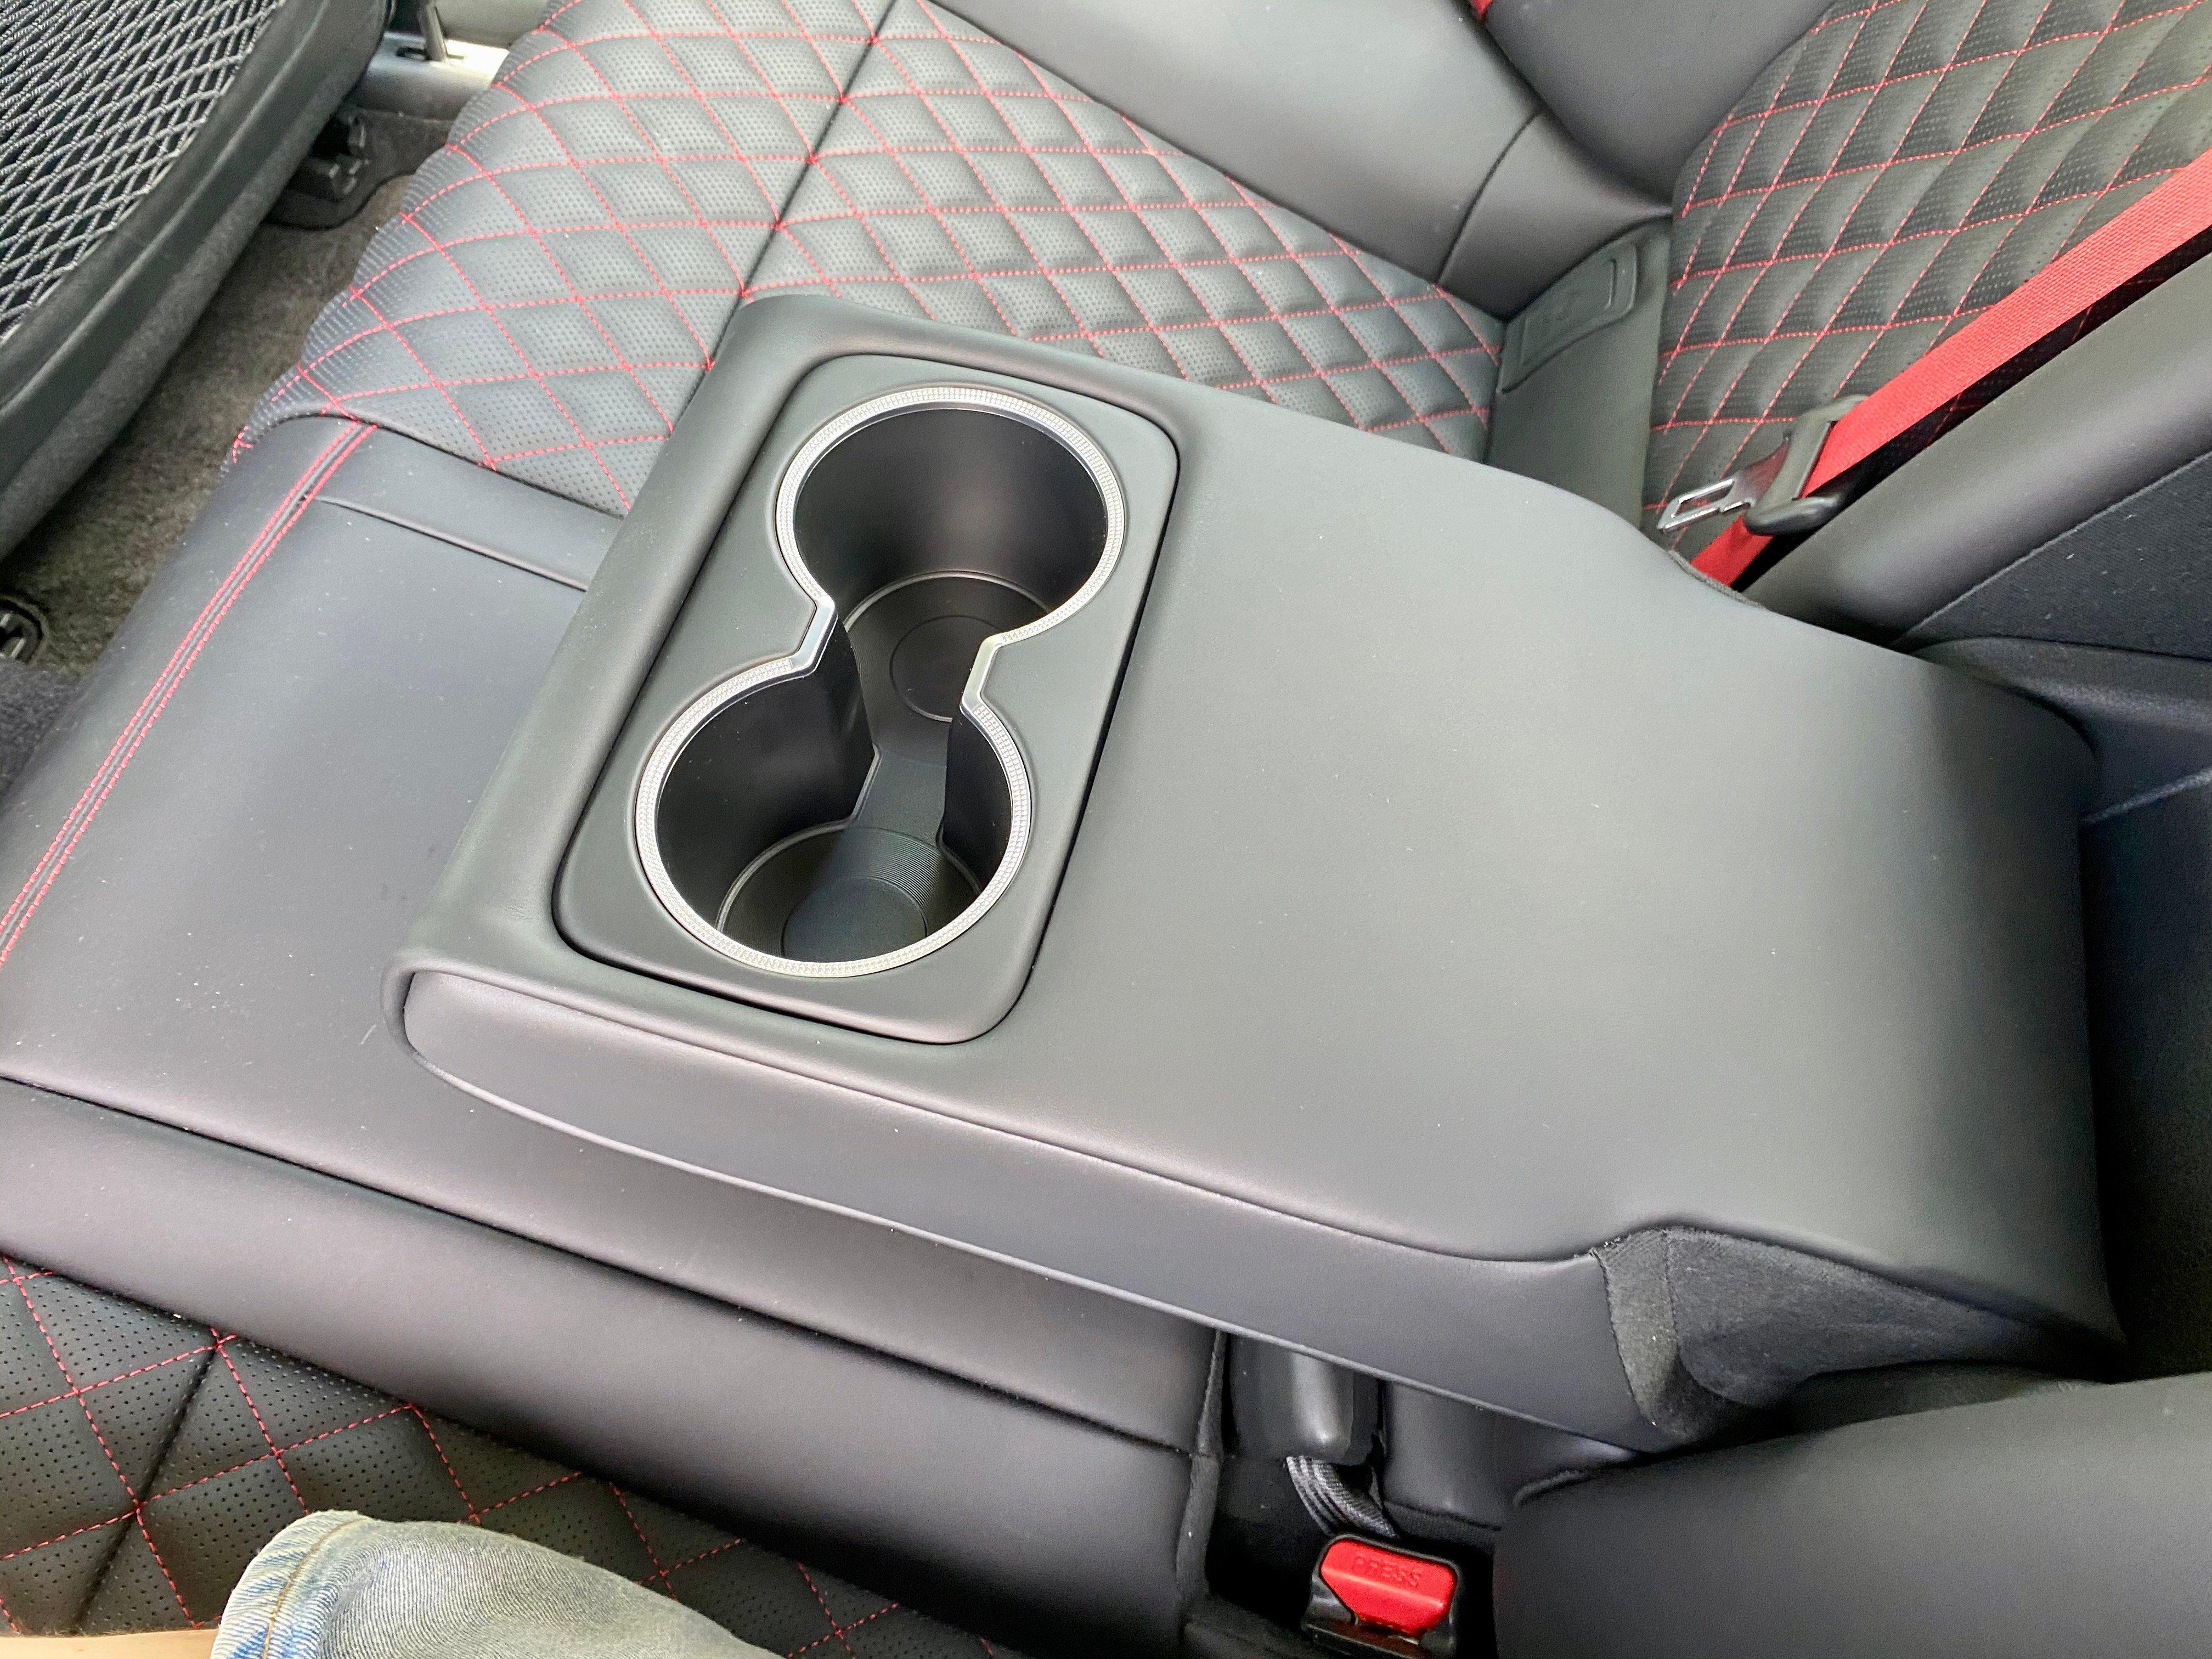 2022-Genesis-g70-cupholders-carprousa